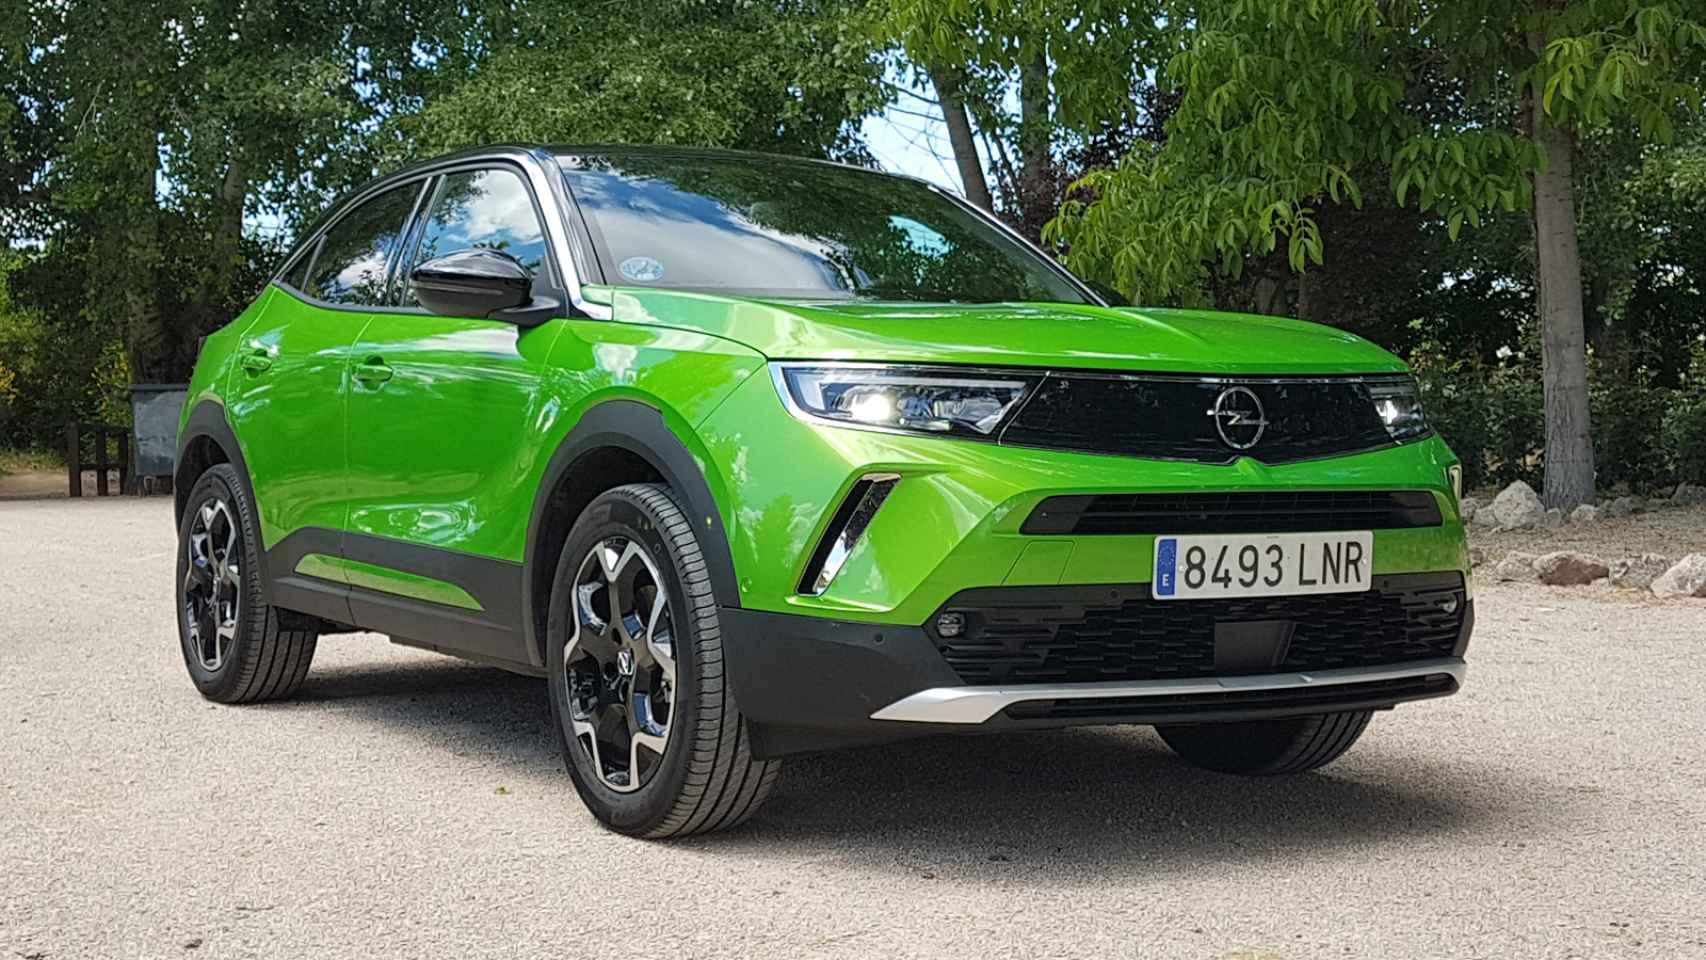 Opel Mokka-e: galería de fotos de este SUV eléctrico